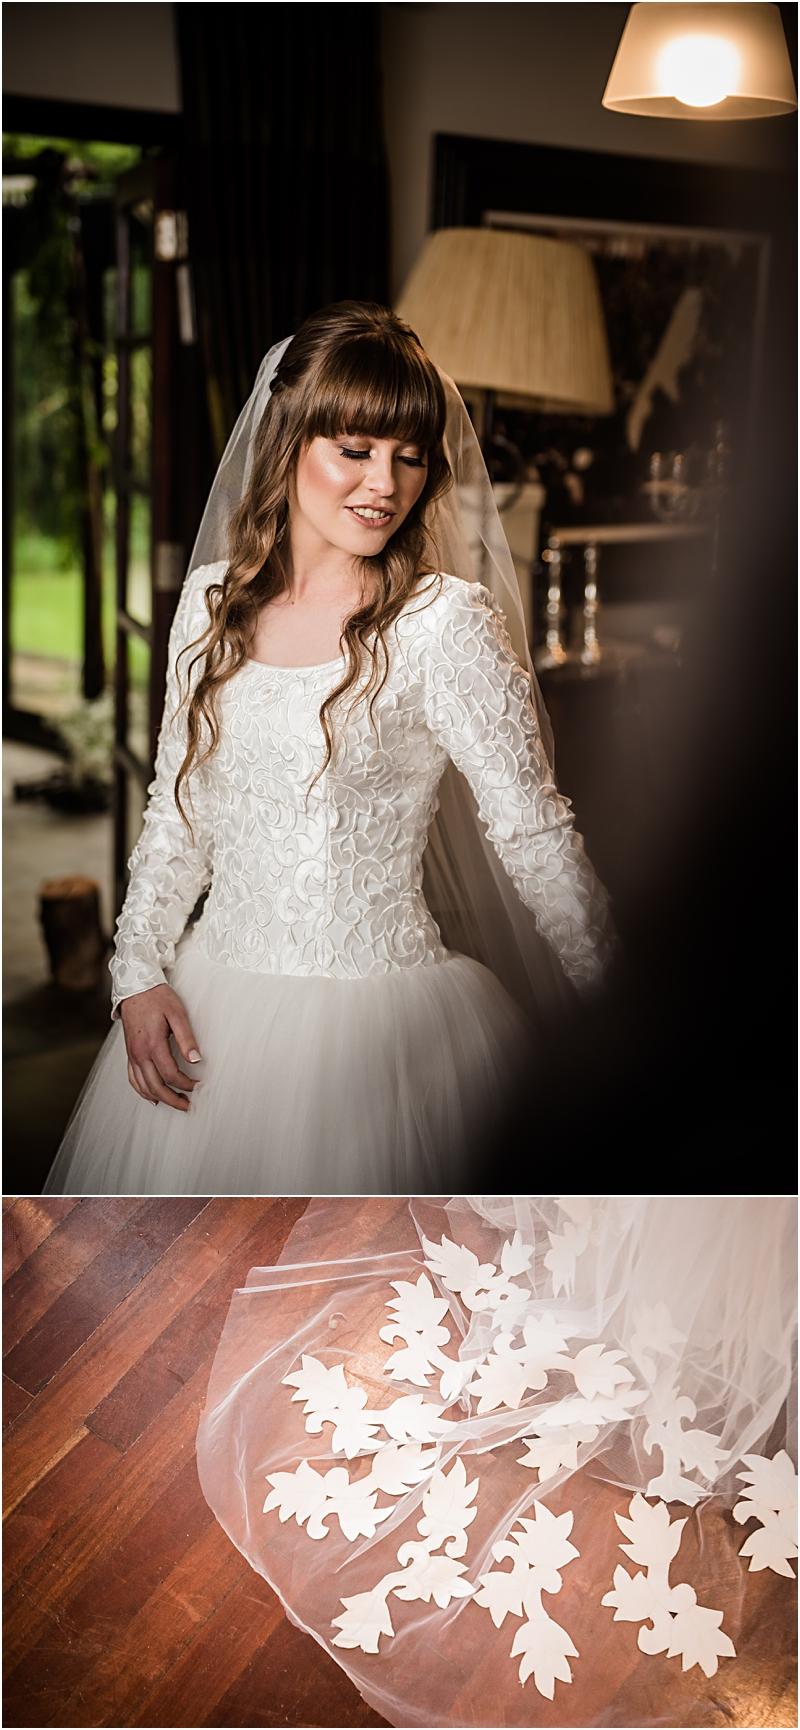 Best wedding photographer - AlexanderSmith_5491.jpg